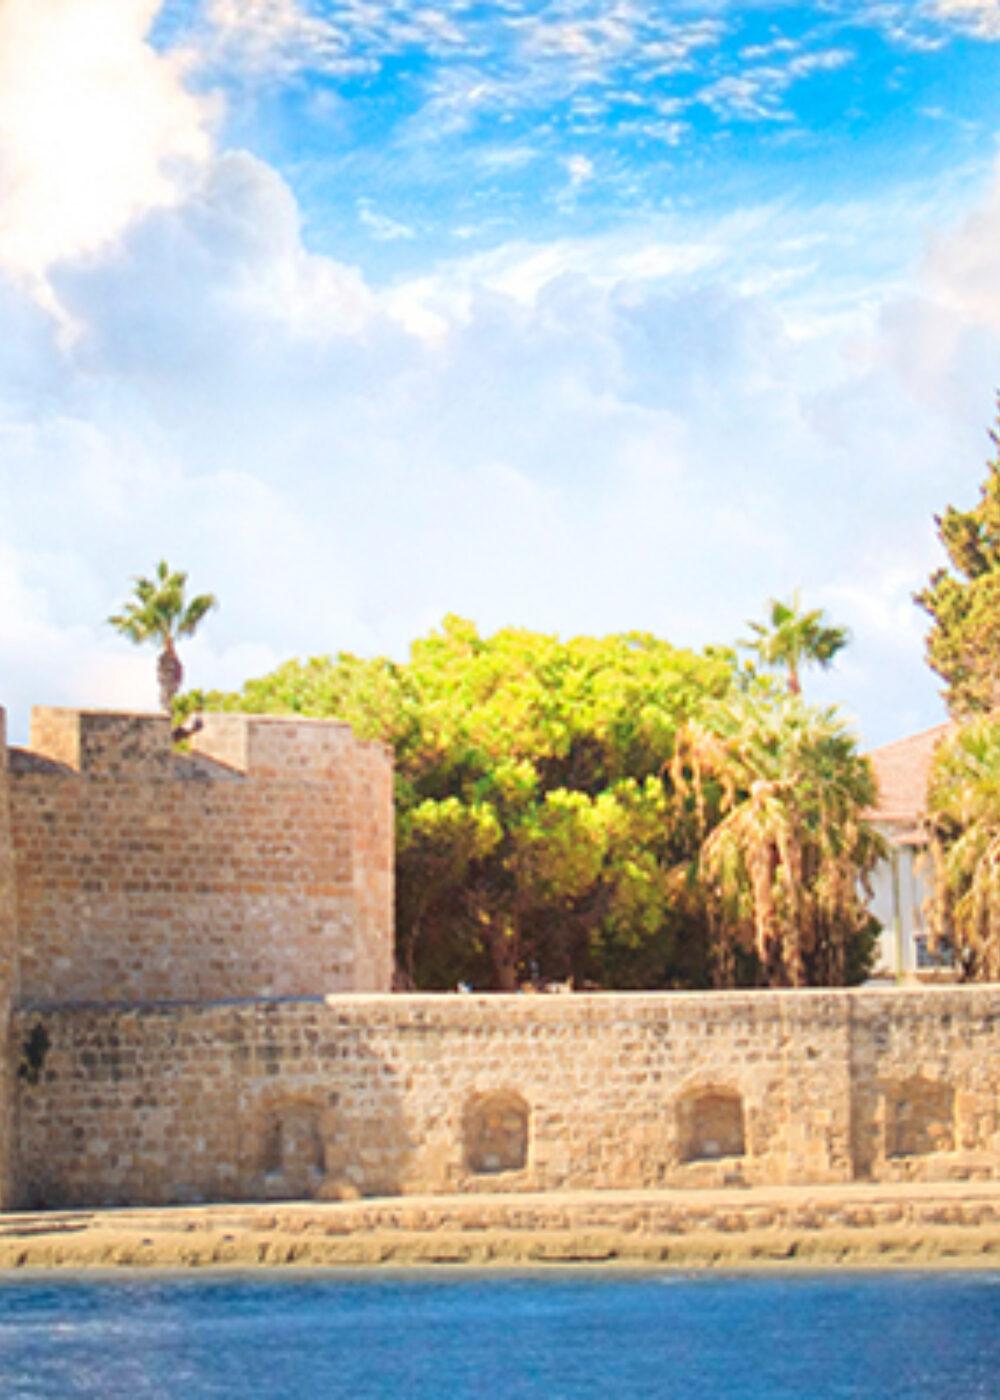 Green Motion Car Rental Cyprus Larnaca Downtown 1440x400